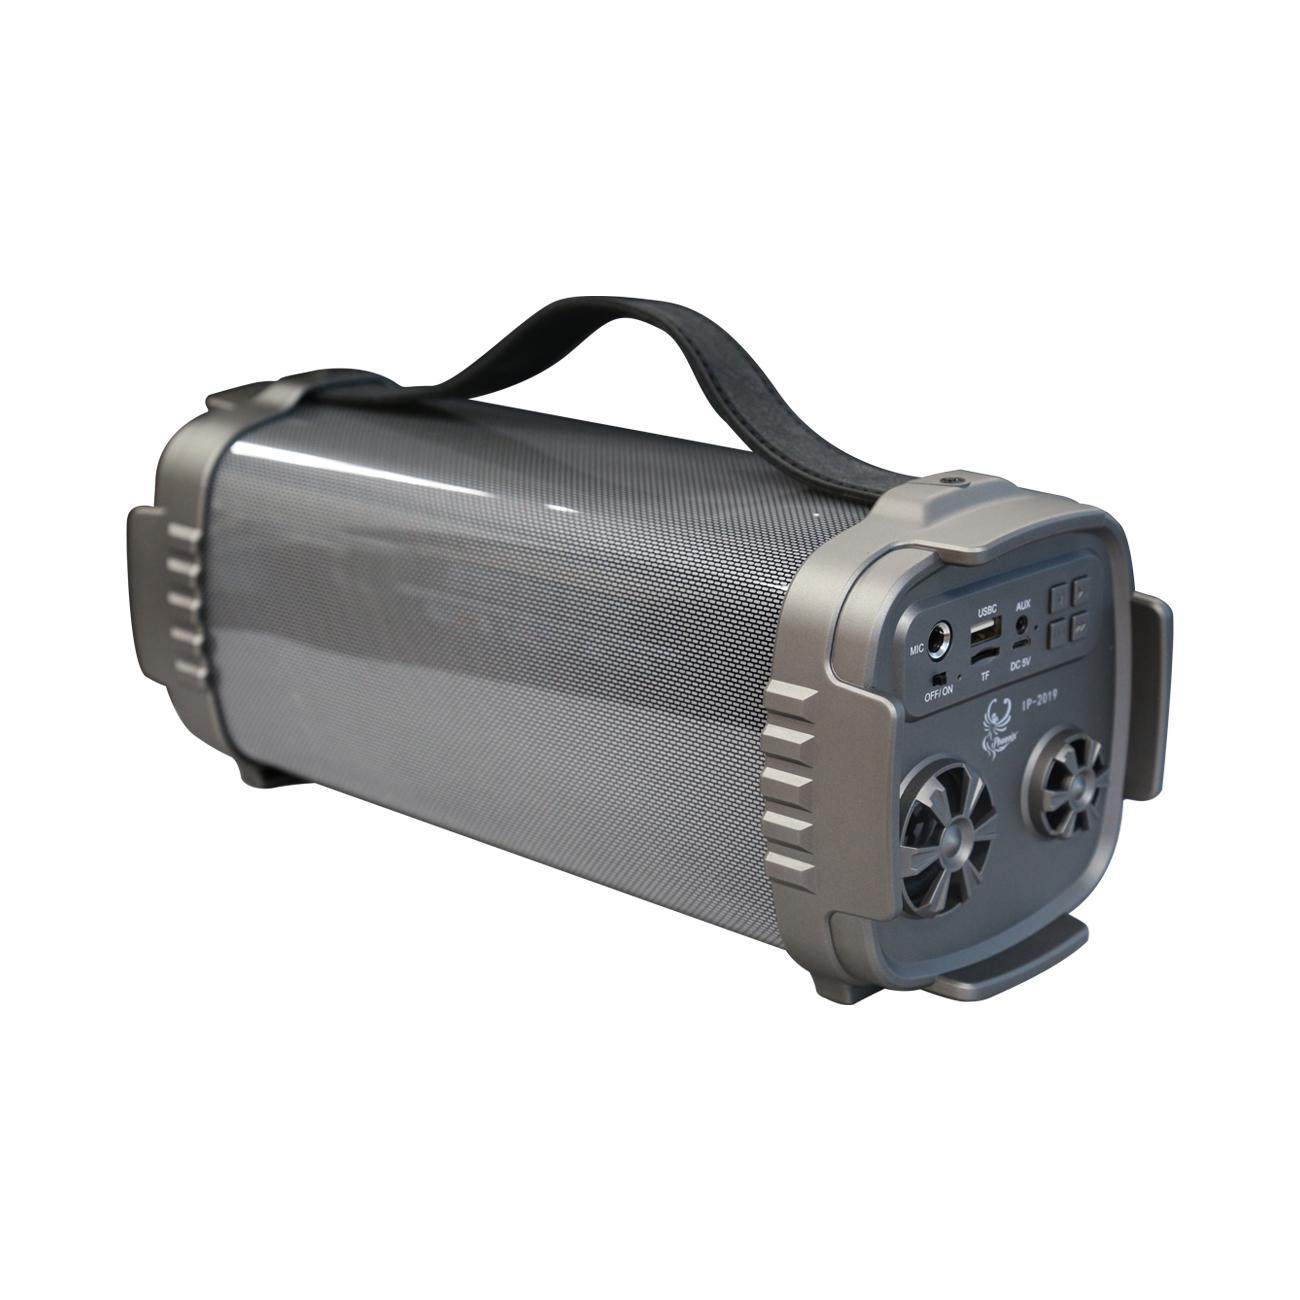 iPhoenix Digital Speaker In Gray